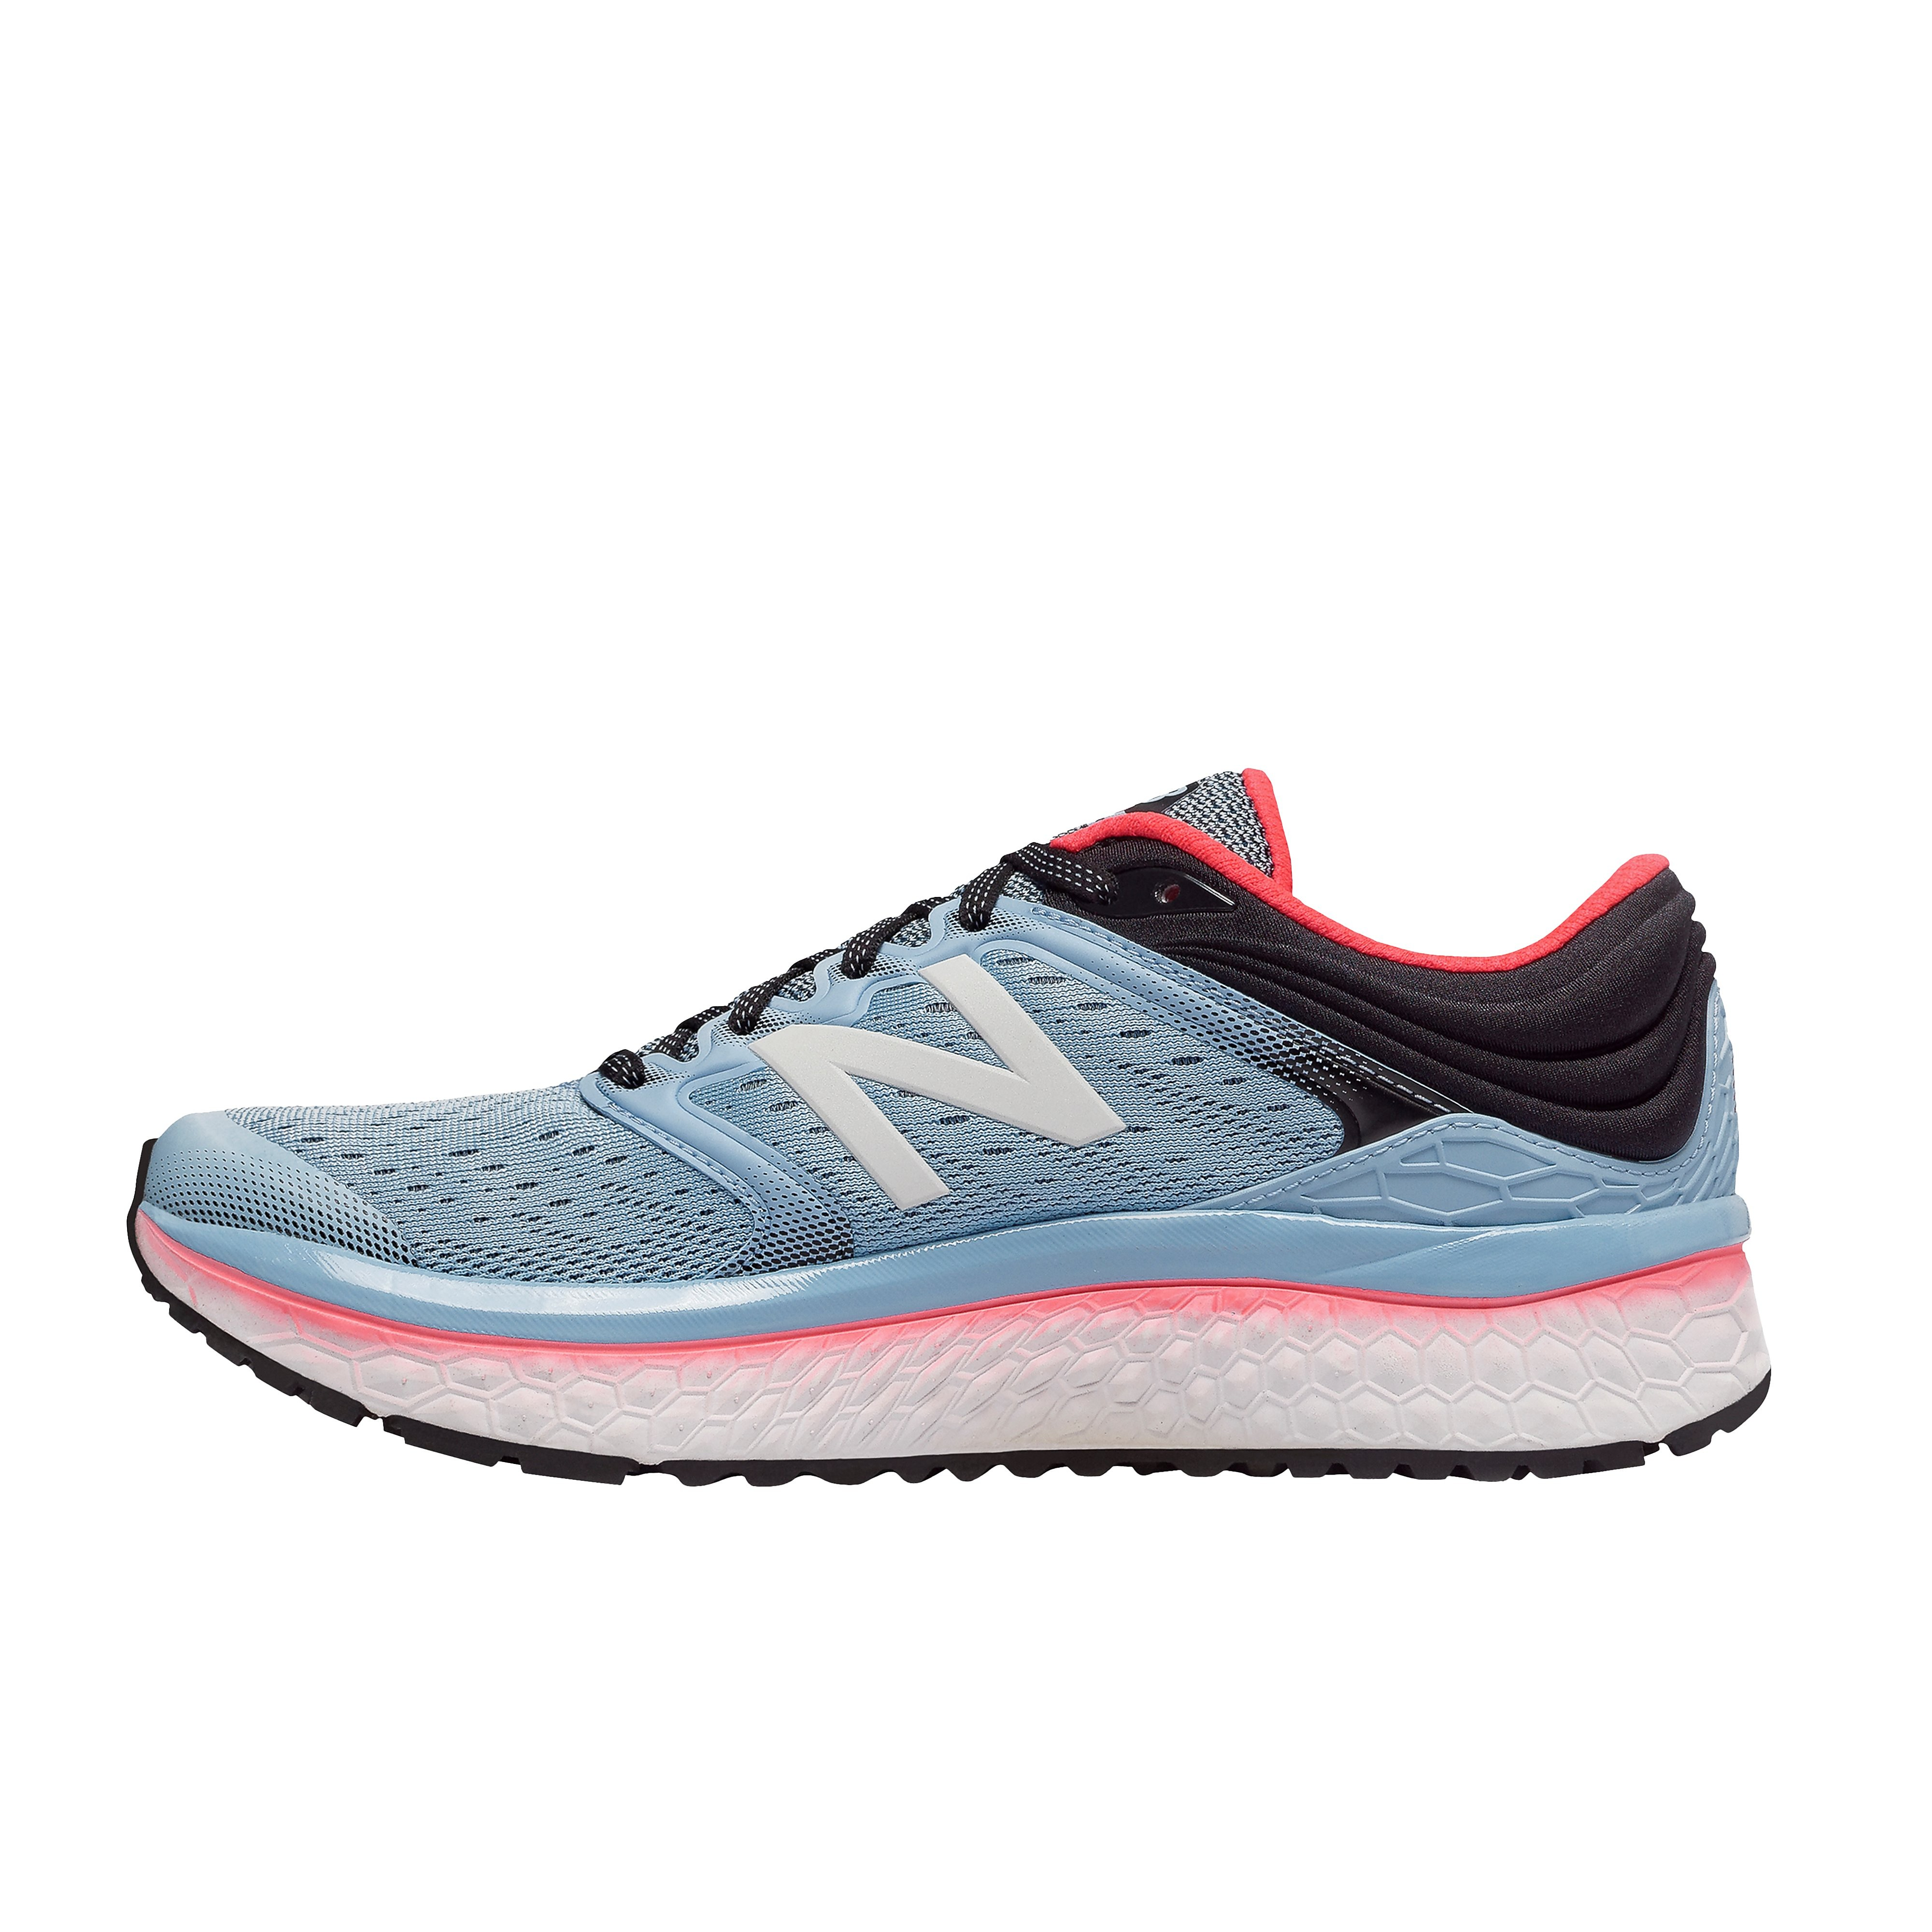 Women's New Balance Fresh Foam 1080v8 Running Shoes - Blue, Blue